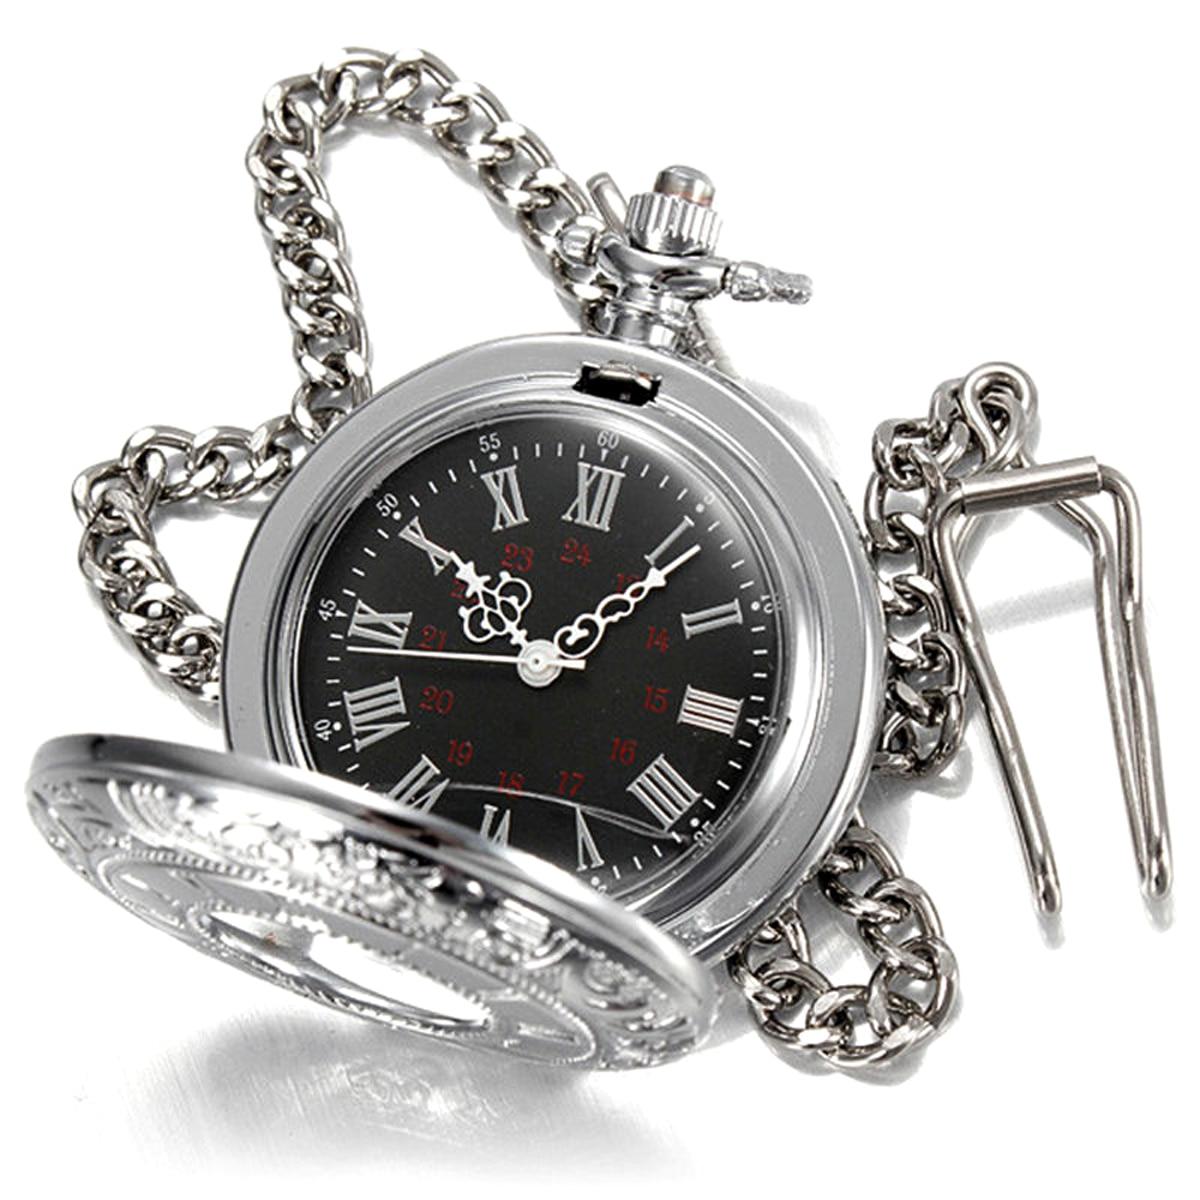 Vintage Pendant Hollow Men Women Pocket Watch Retro Roman Numerals Silver Color Quartz Necklace Chain Pocketwatch Birthday Gift